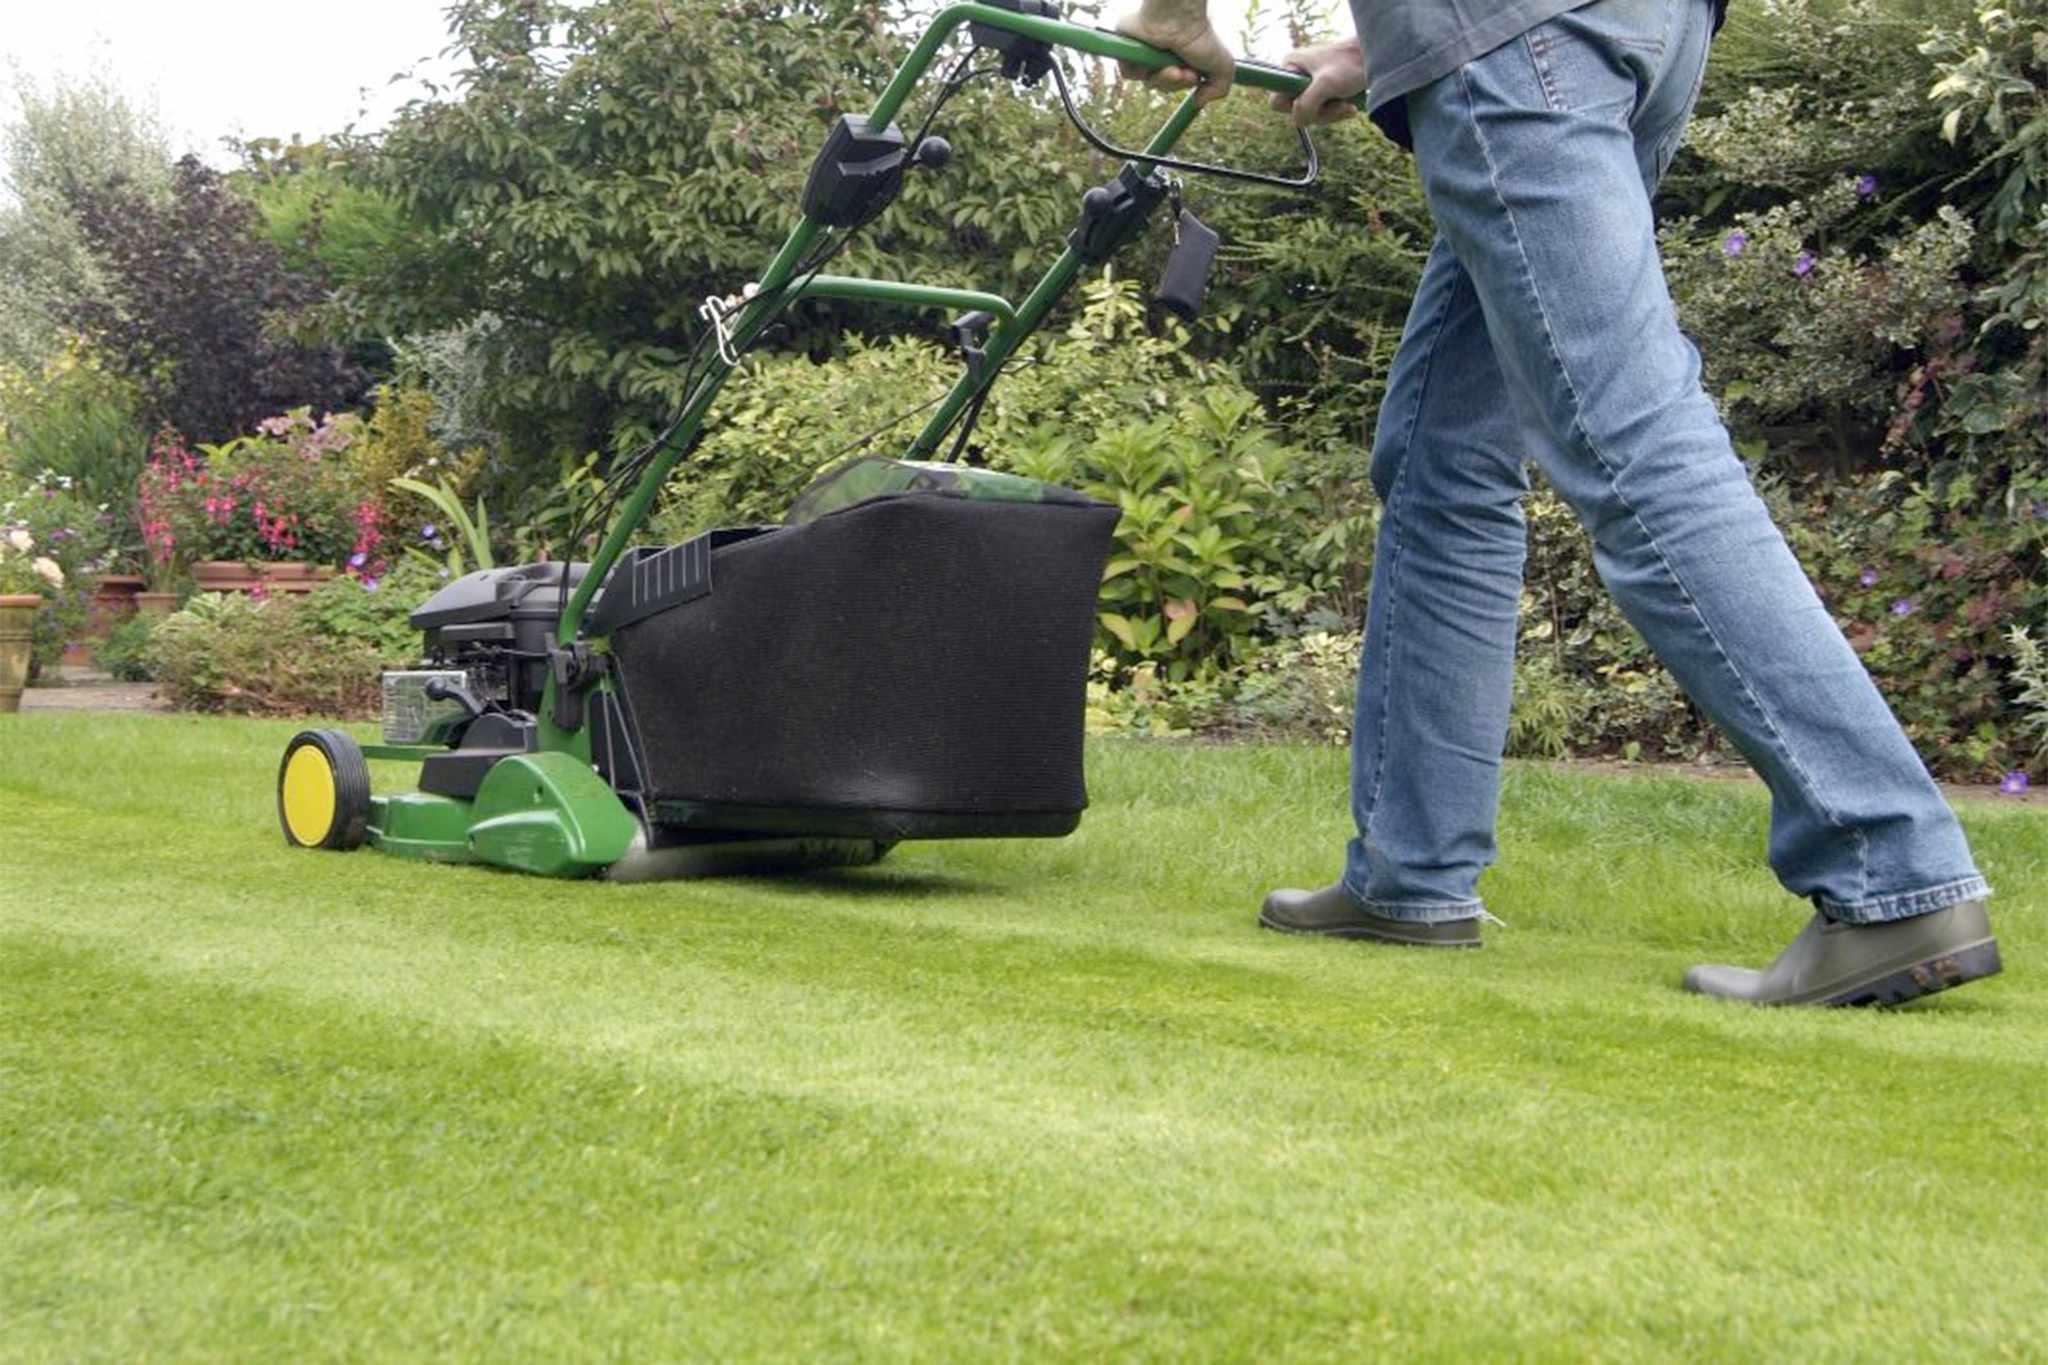 Mowing stripes onto a lawn